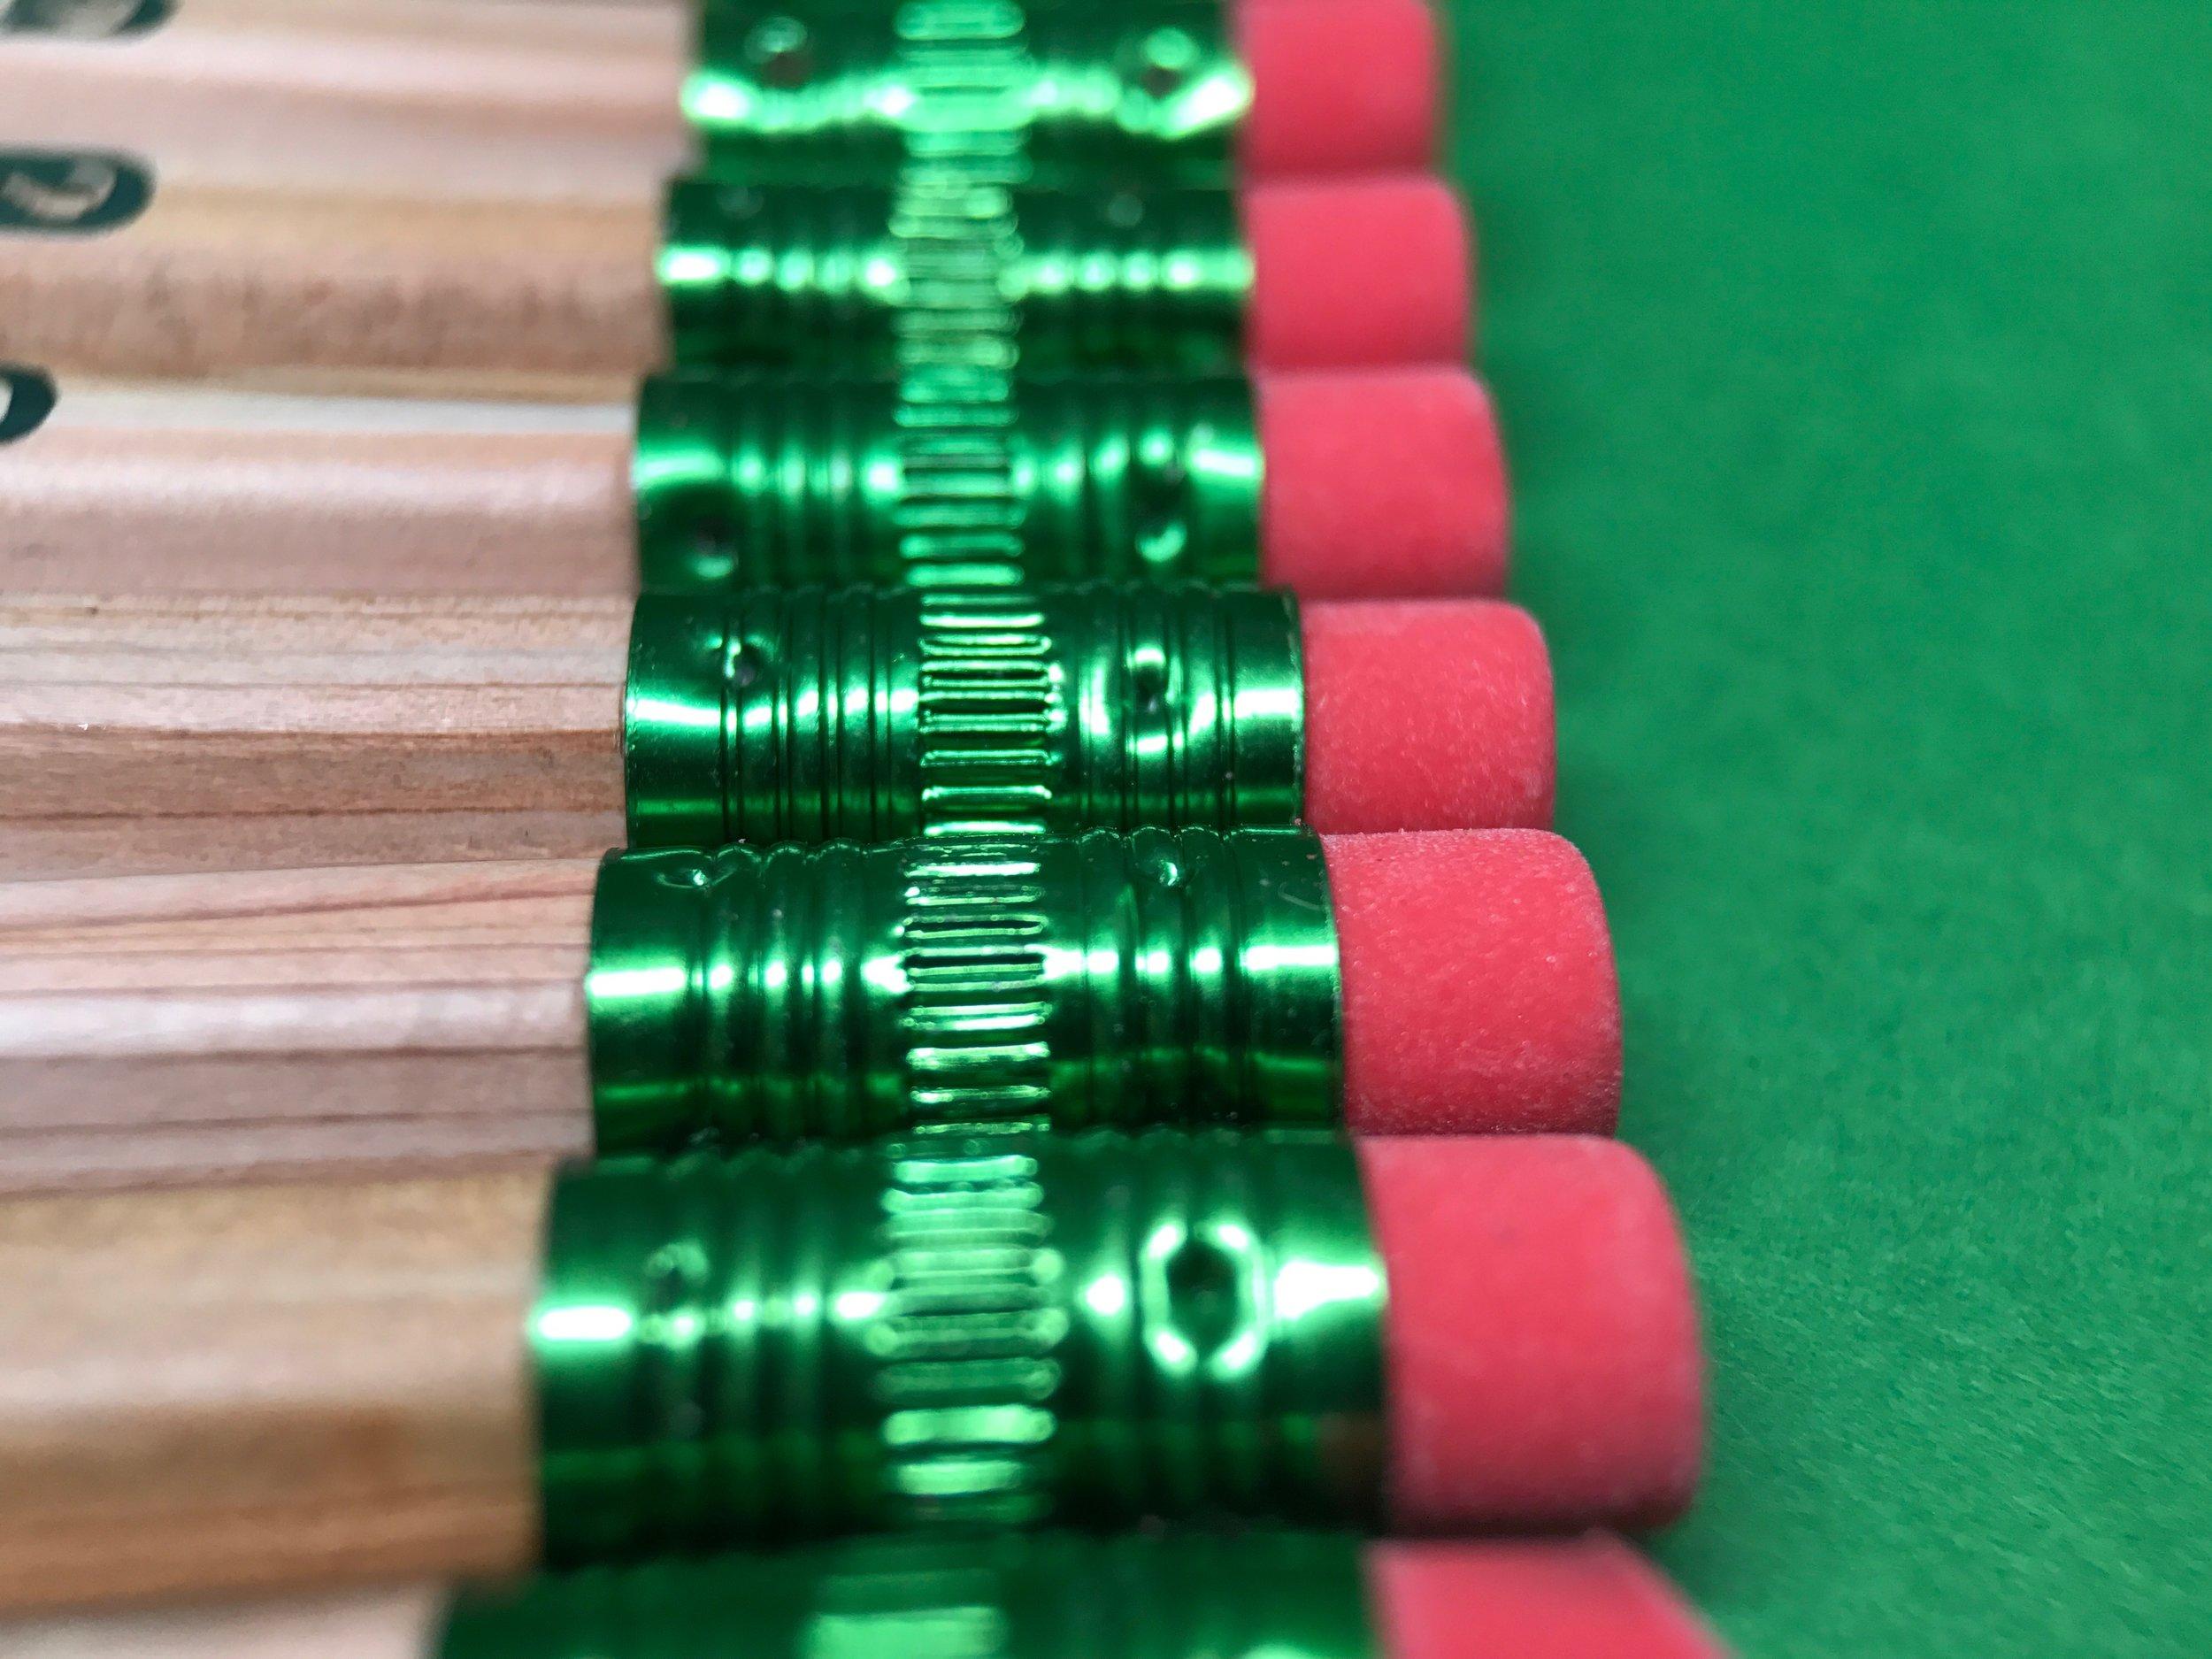 palomino-forest-choice-pencil-9.jpg